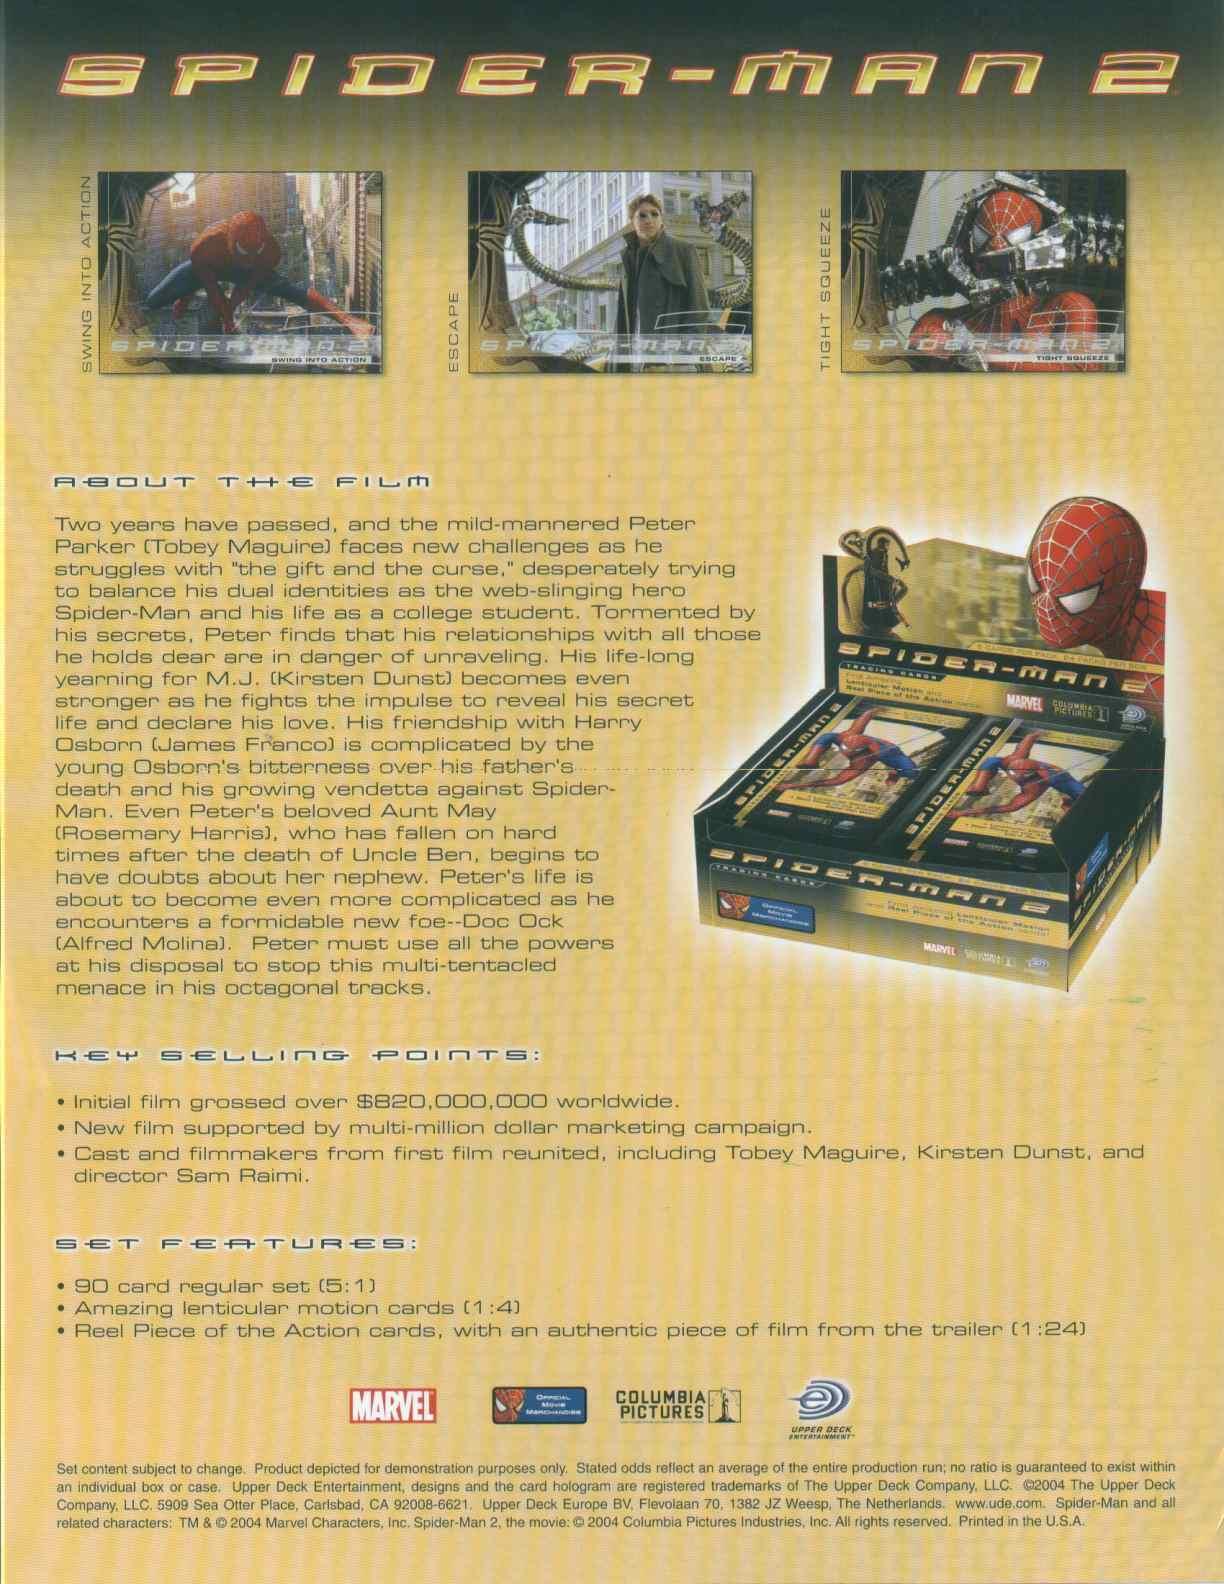 Spiderman 2 Movie Box Potomac Distribution